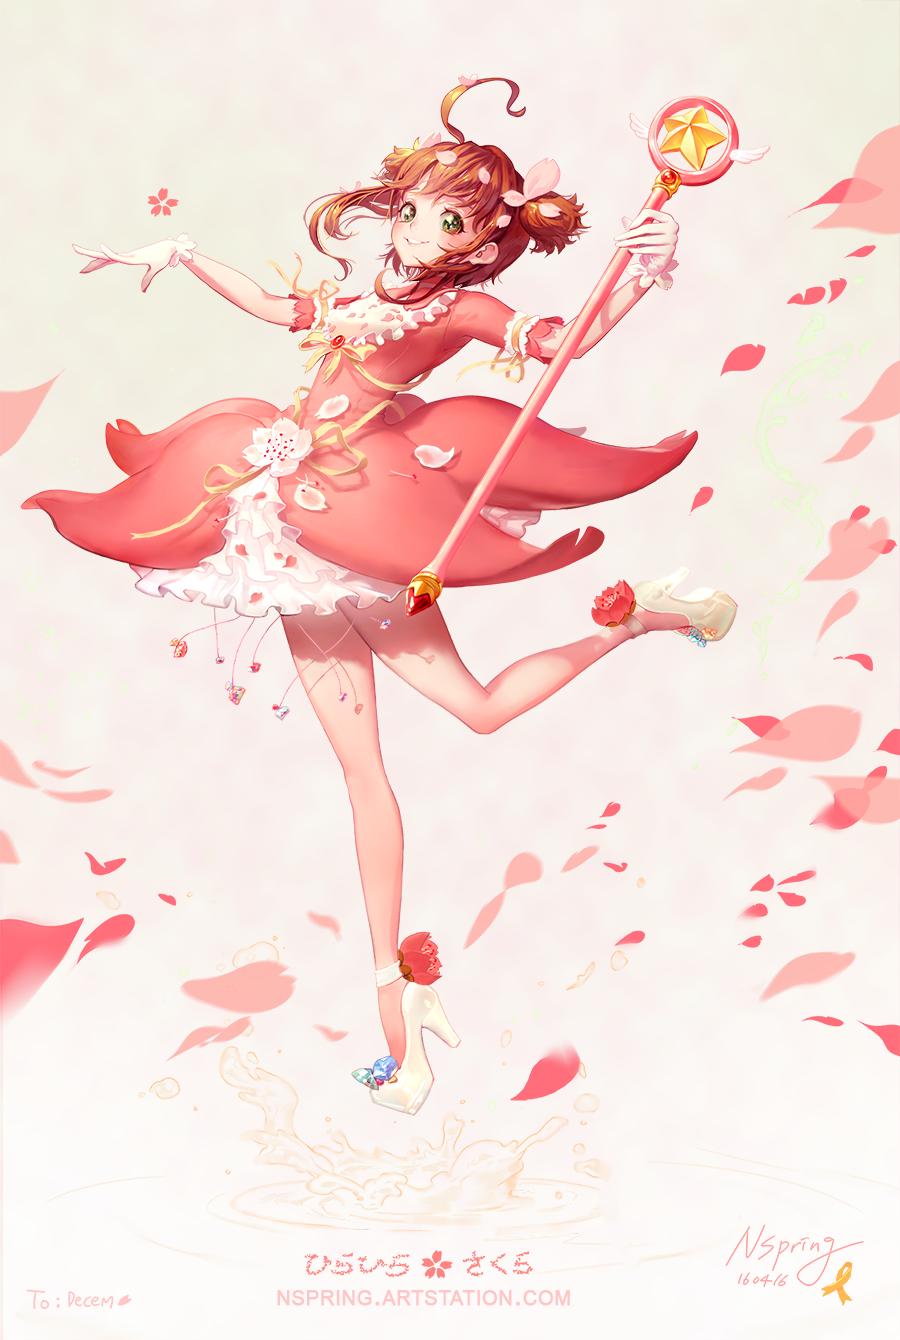 Fluttering blossom by pt0317 on DeviantArt